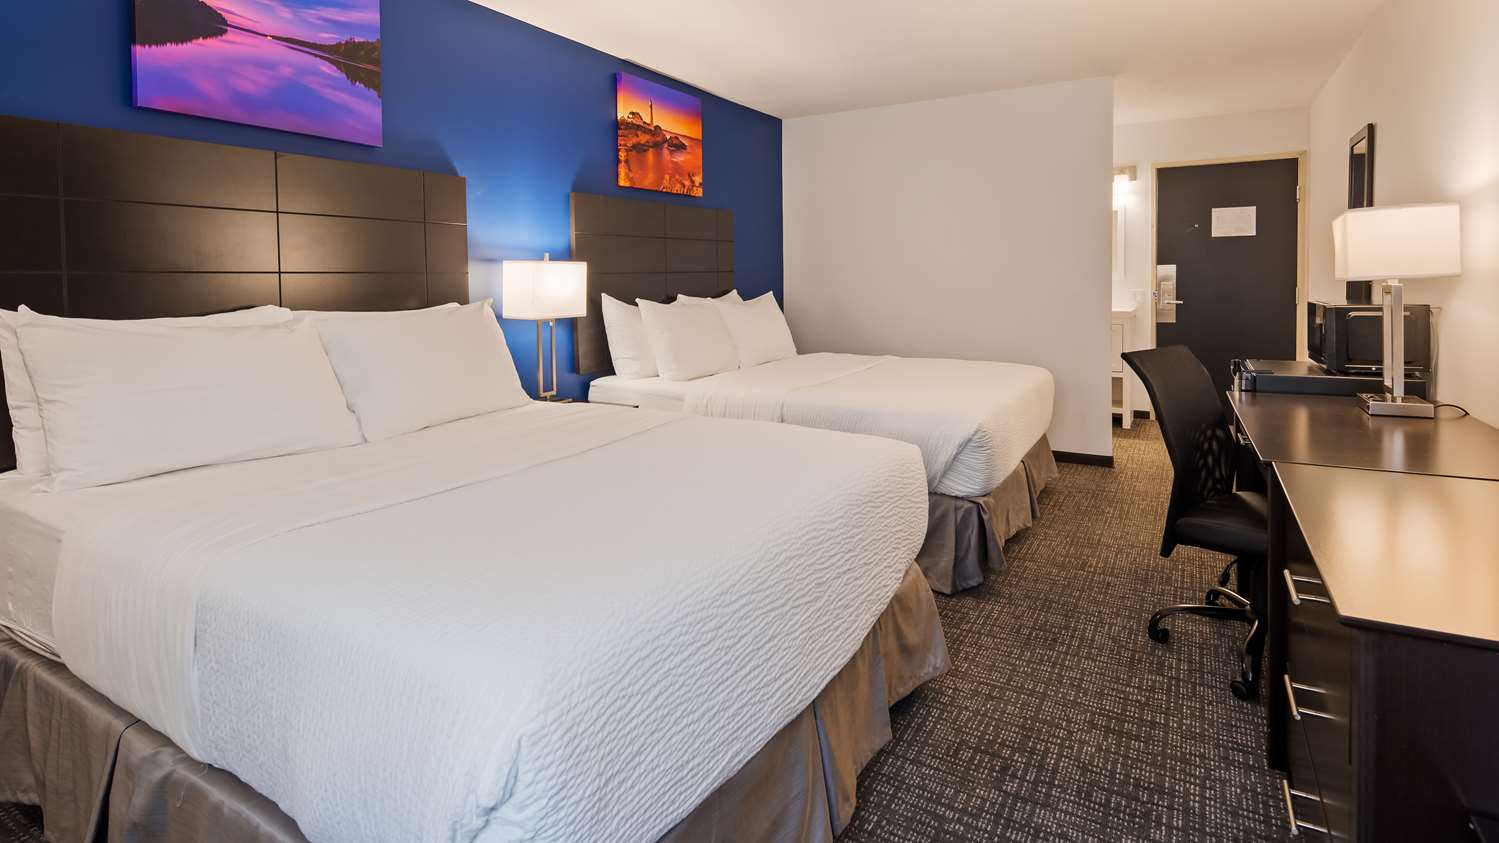 Room - SureStay Hotel by Best Western Presque Isle